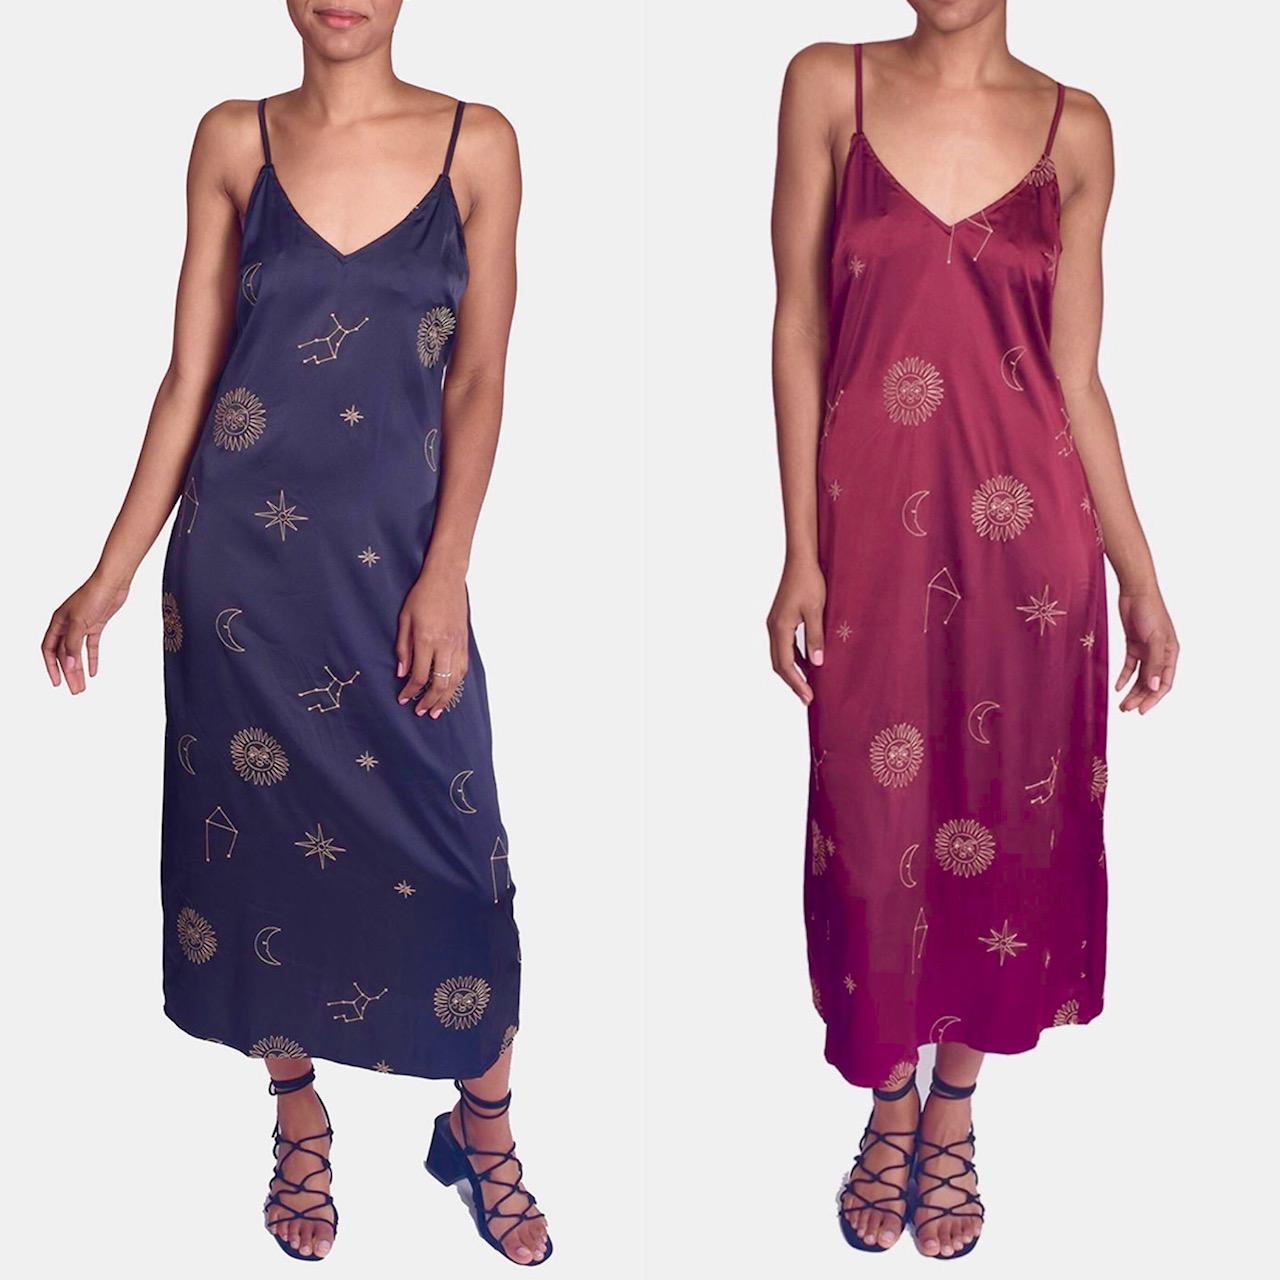 Witchy_Woman_Slip_Dress.jpg